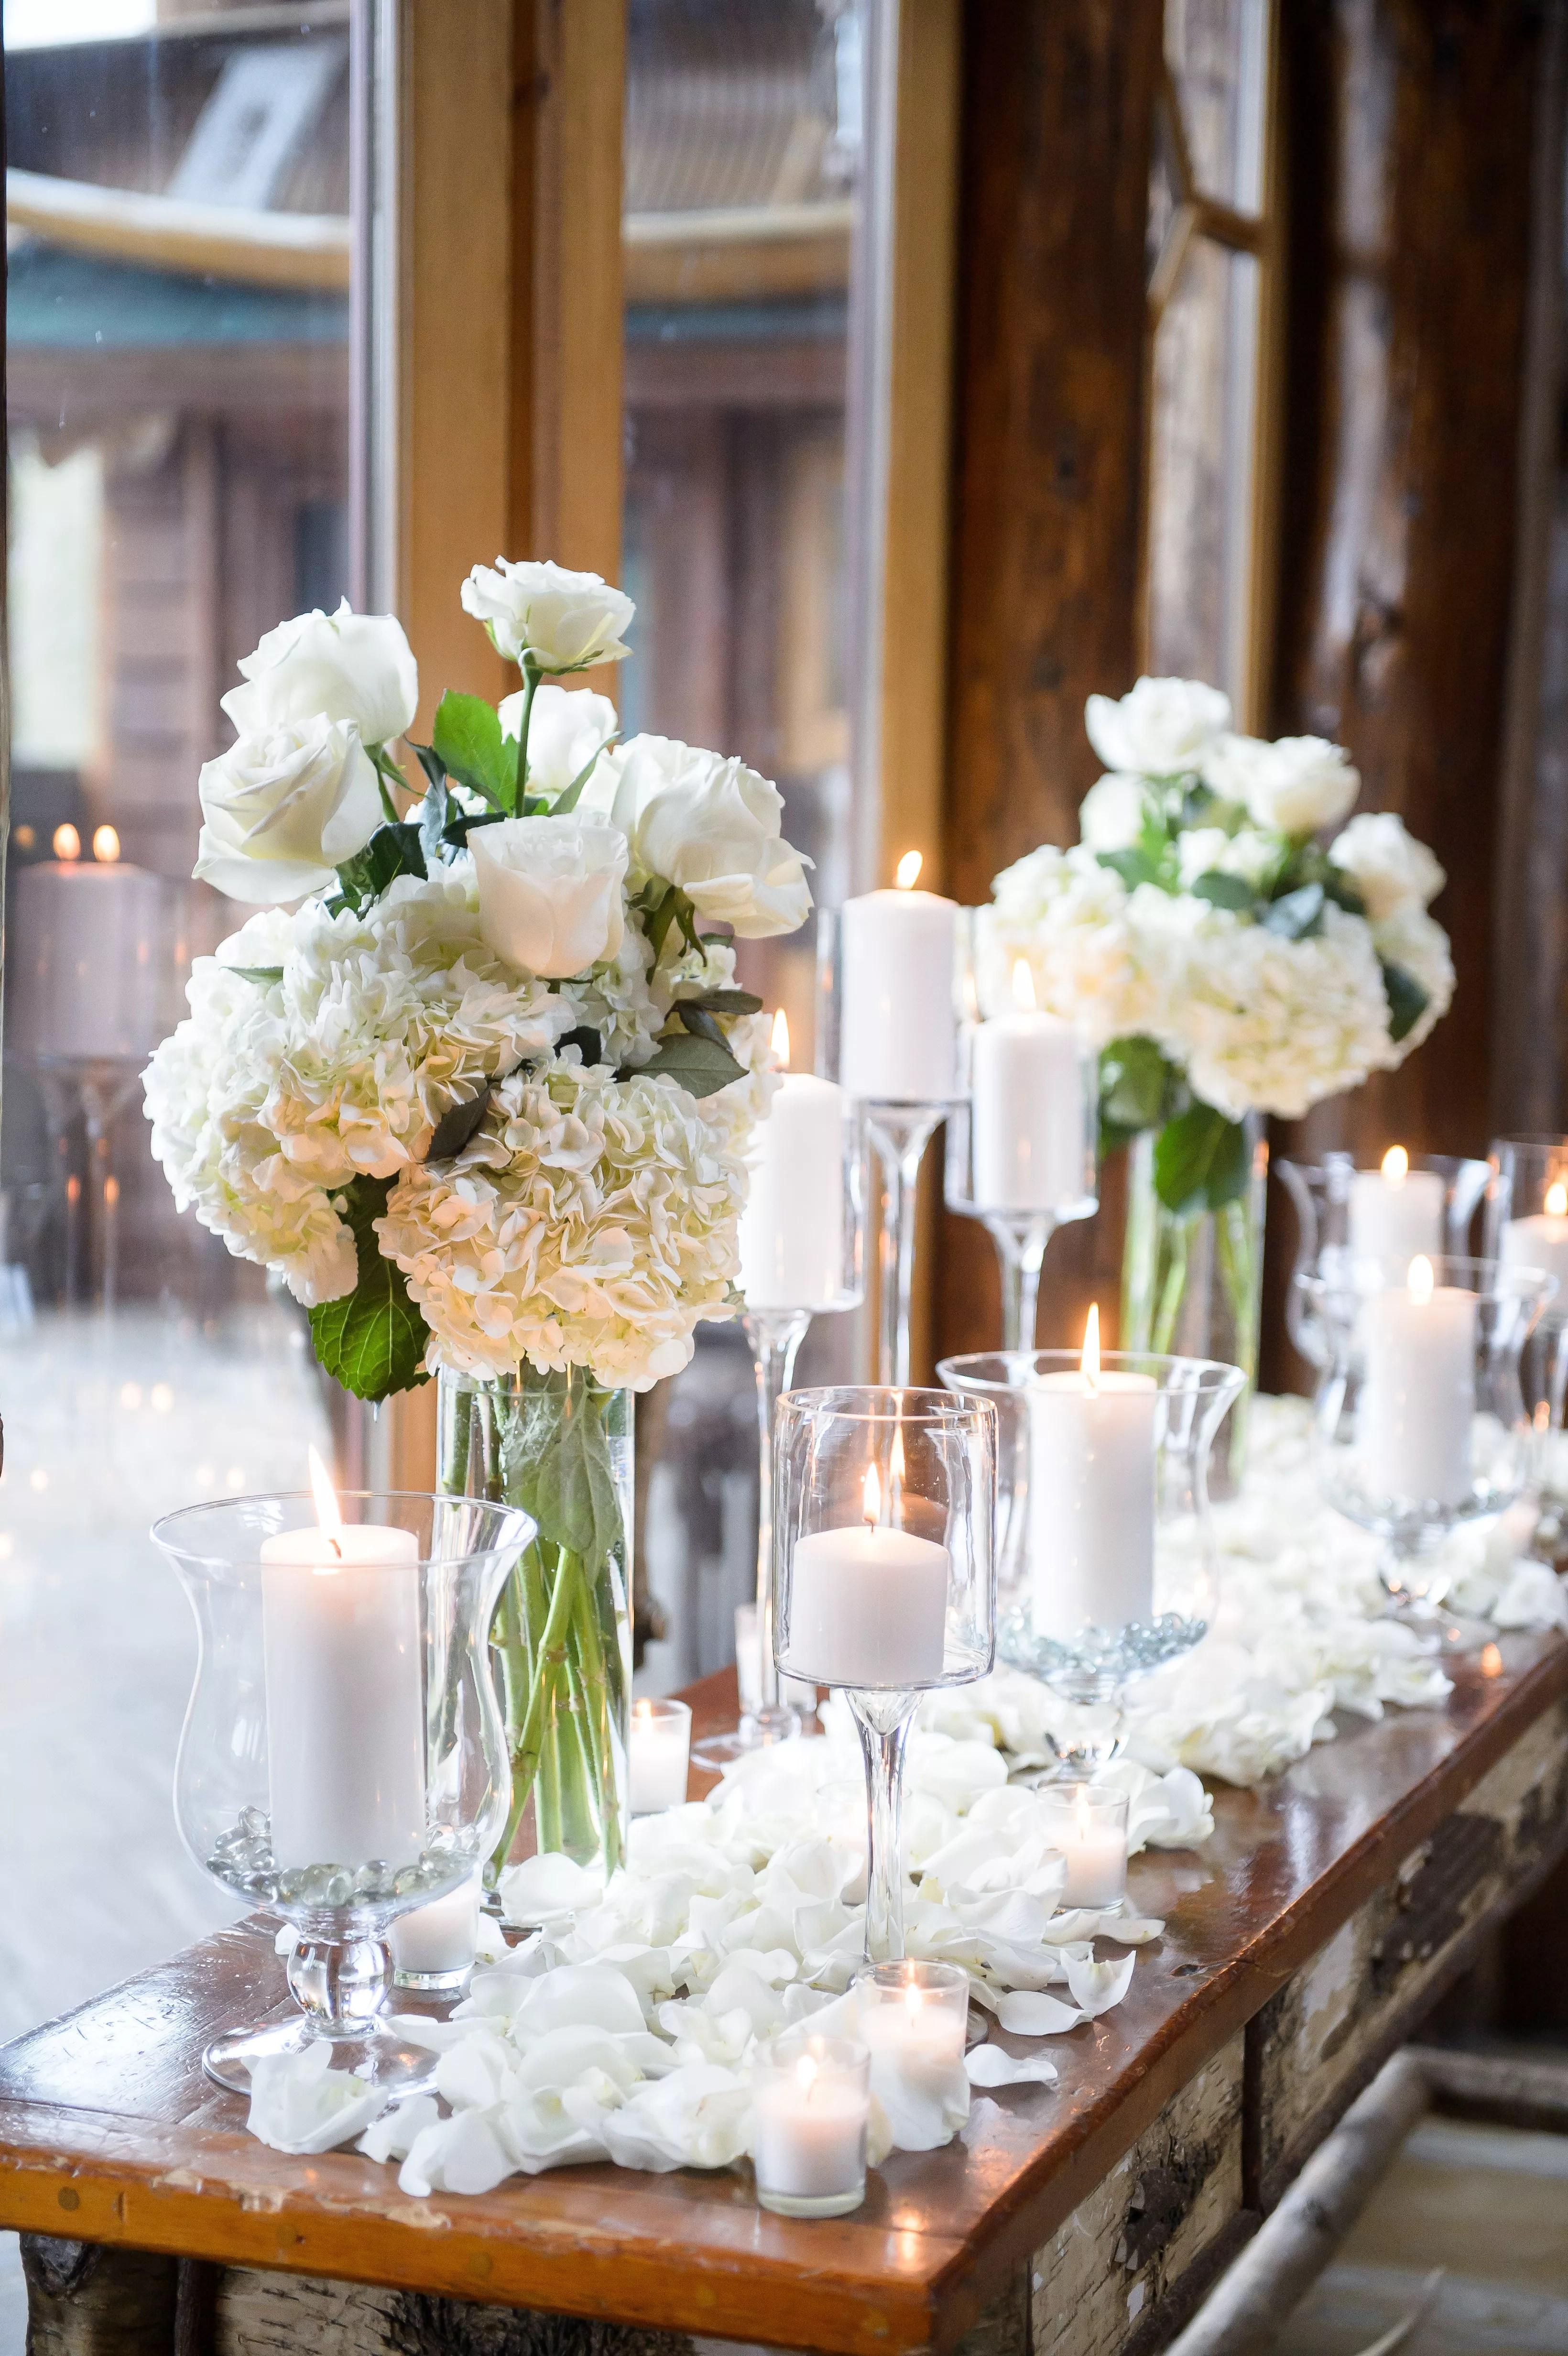 Romantic Hydrangea and Pillar Candle Centerpieces